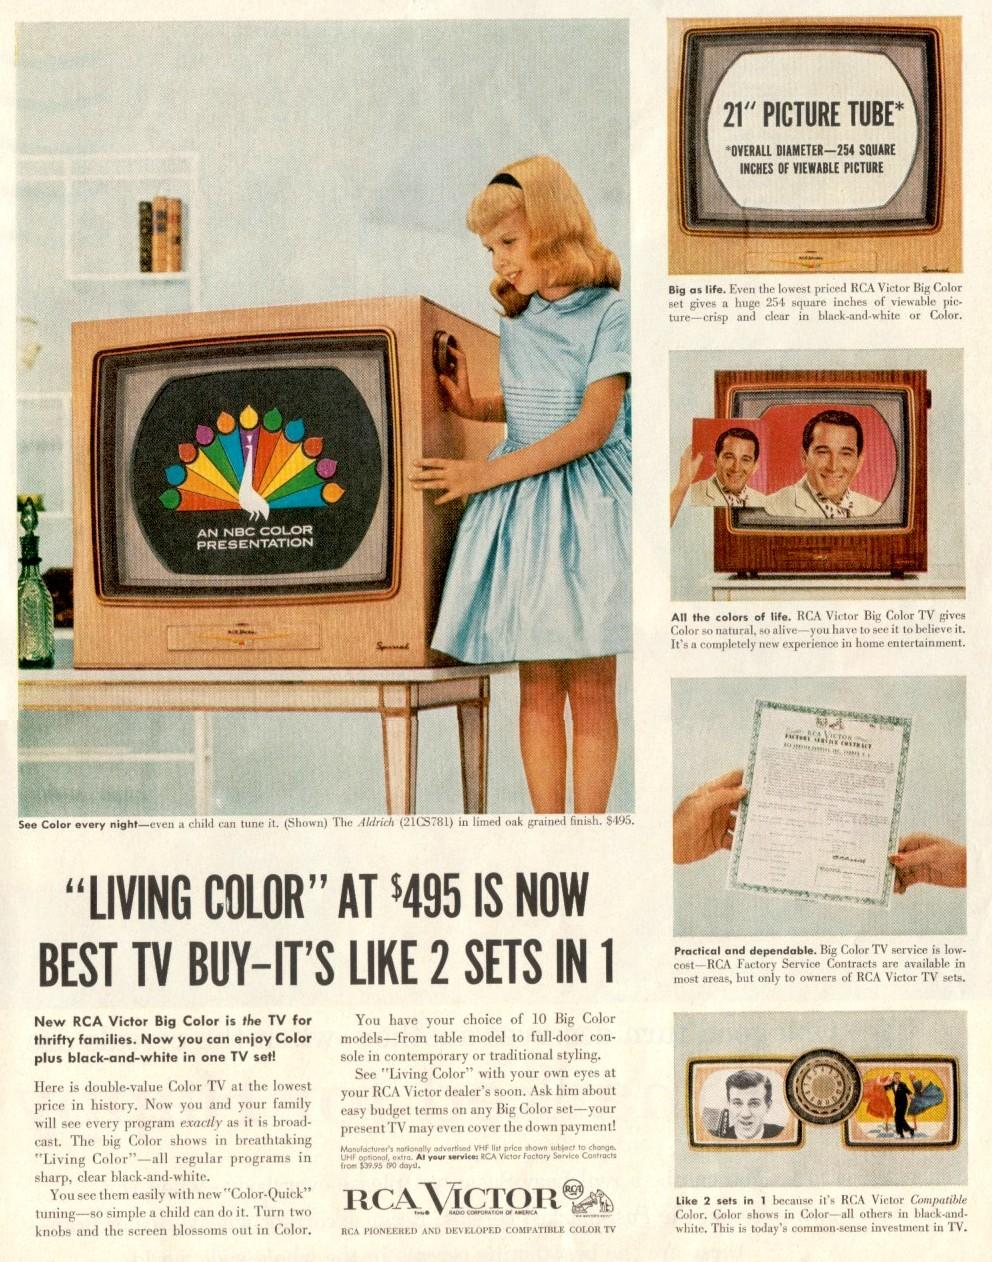 rca1956ad2-1.jpg